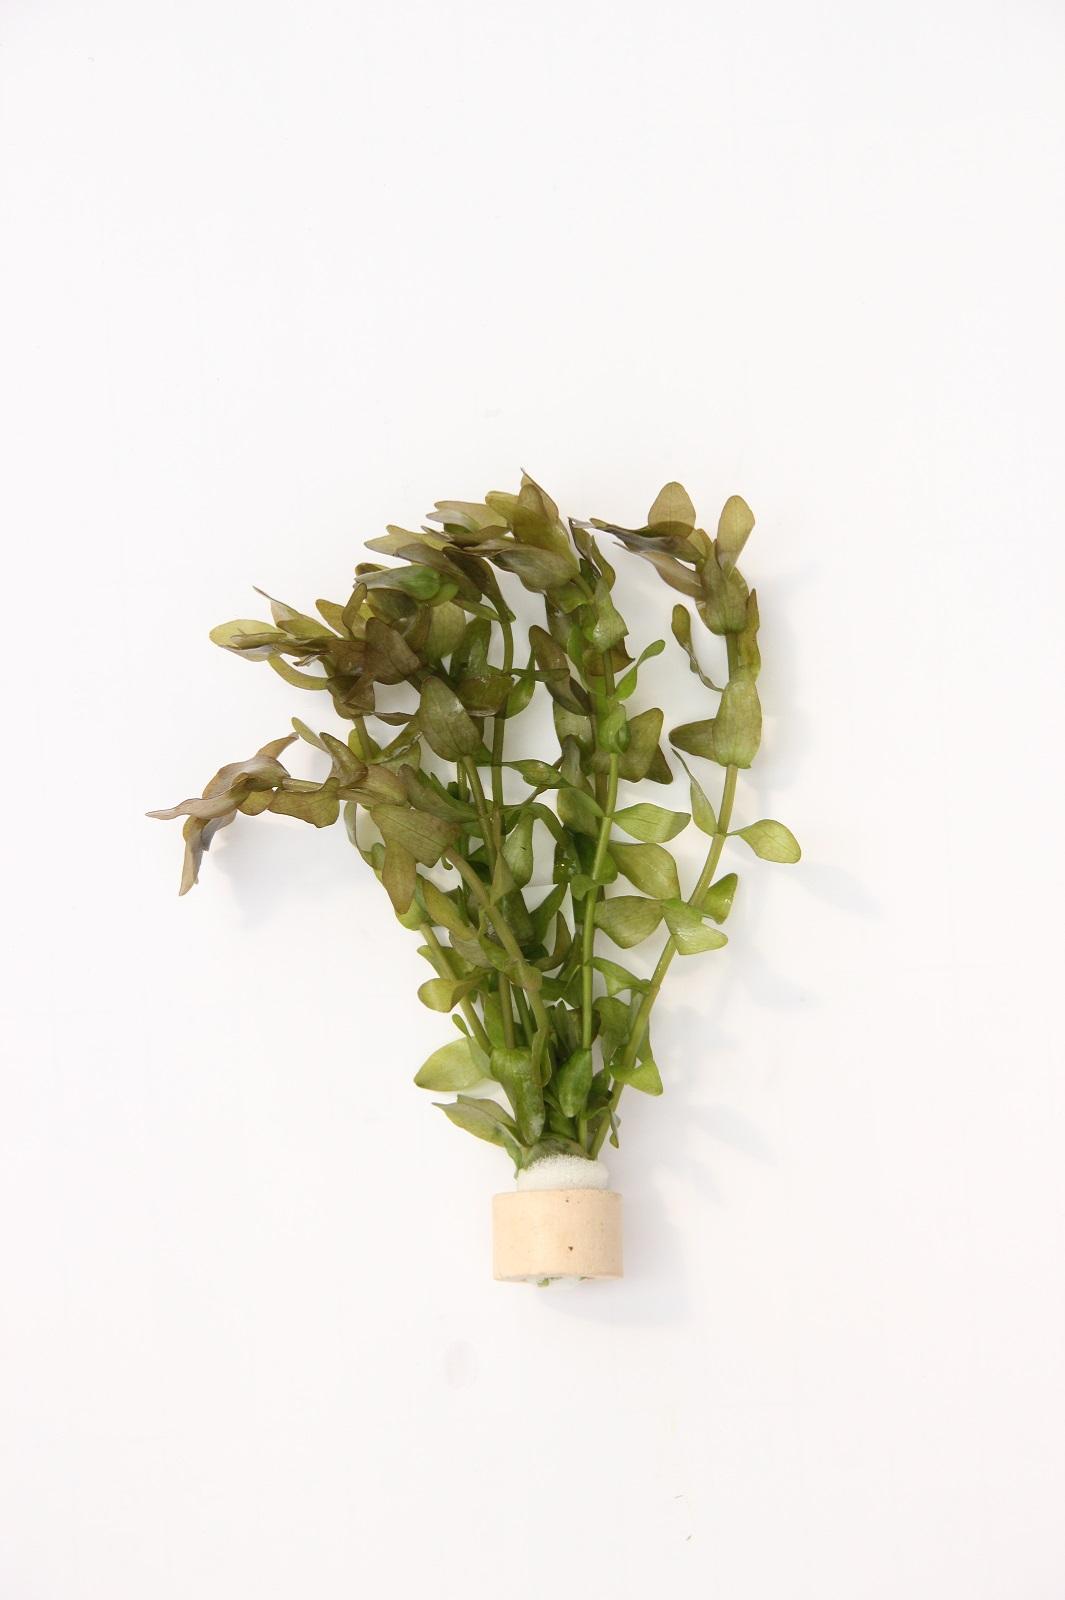 1 Tonring Bacopa carolineana eine schöne Aquariumpflanze